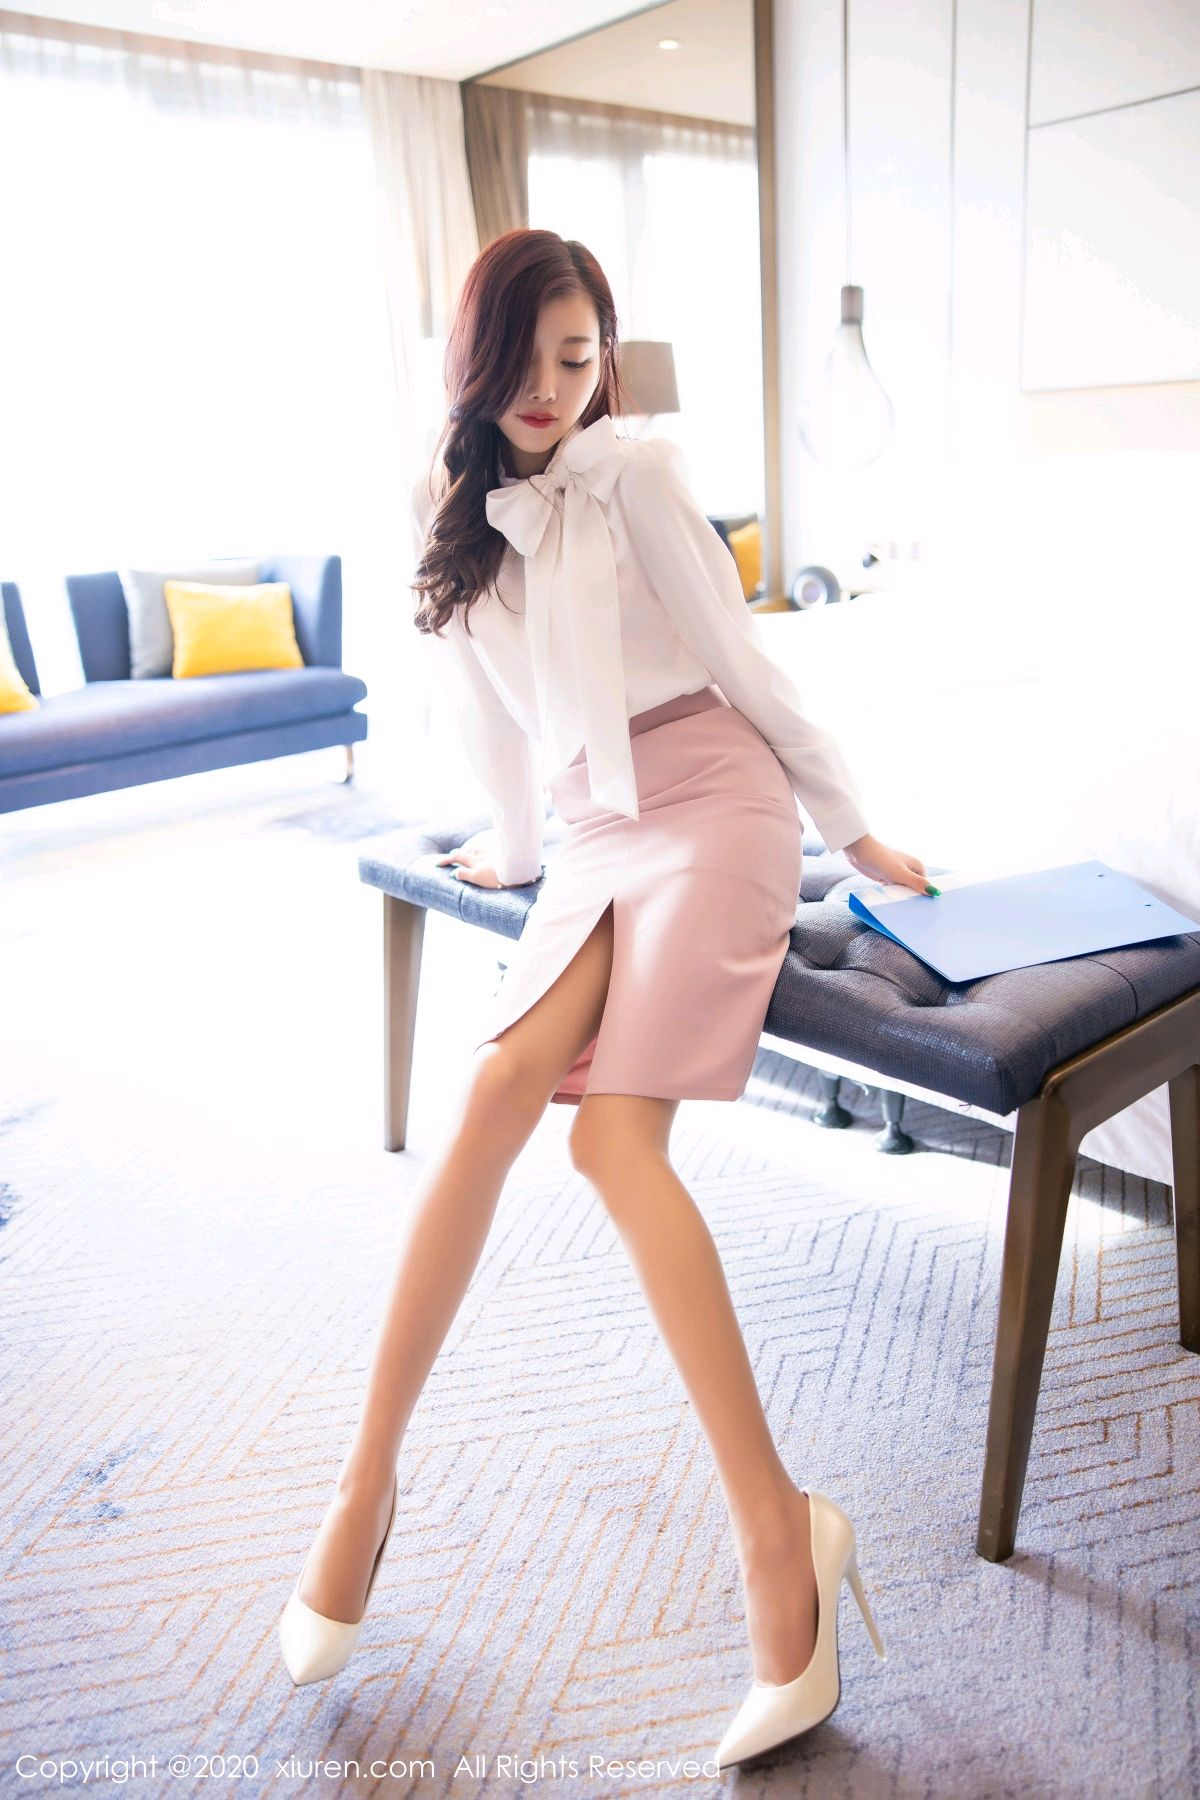 [XiuRen] Vol.2431 Yang Chen Chen 10P, Tall, Underwear, Uniform, Xiuren, Yang Chen Chen